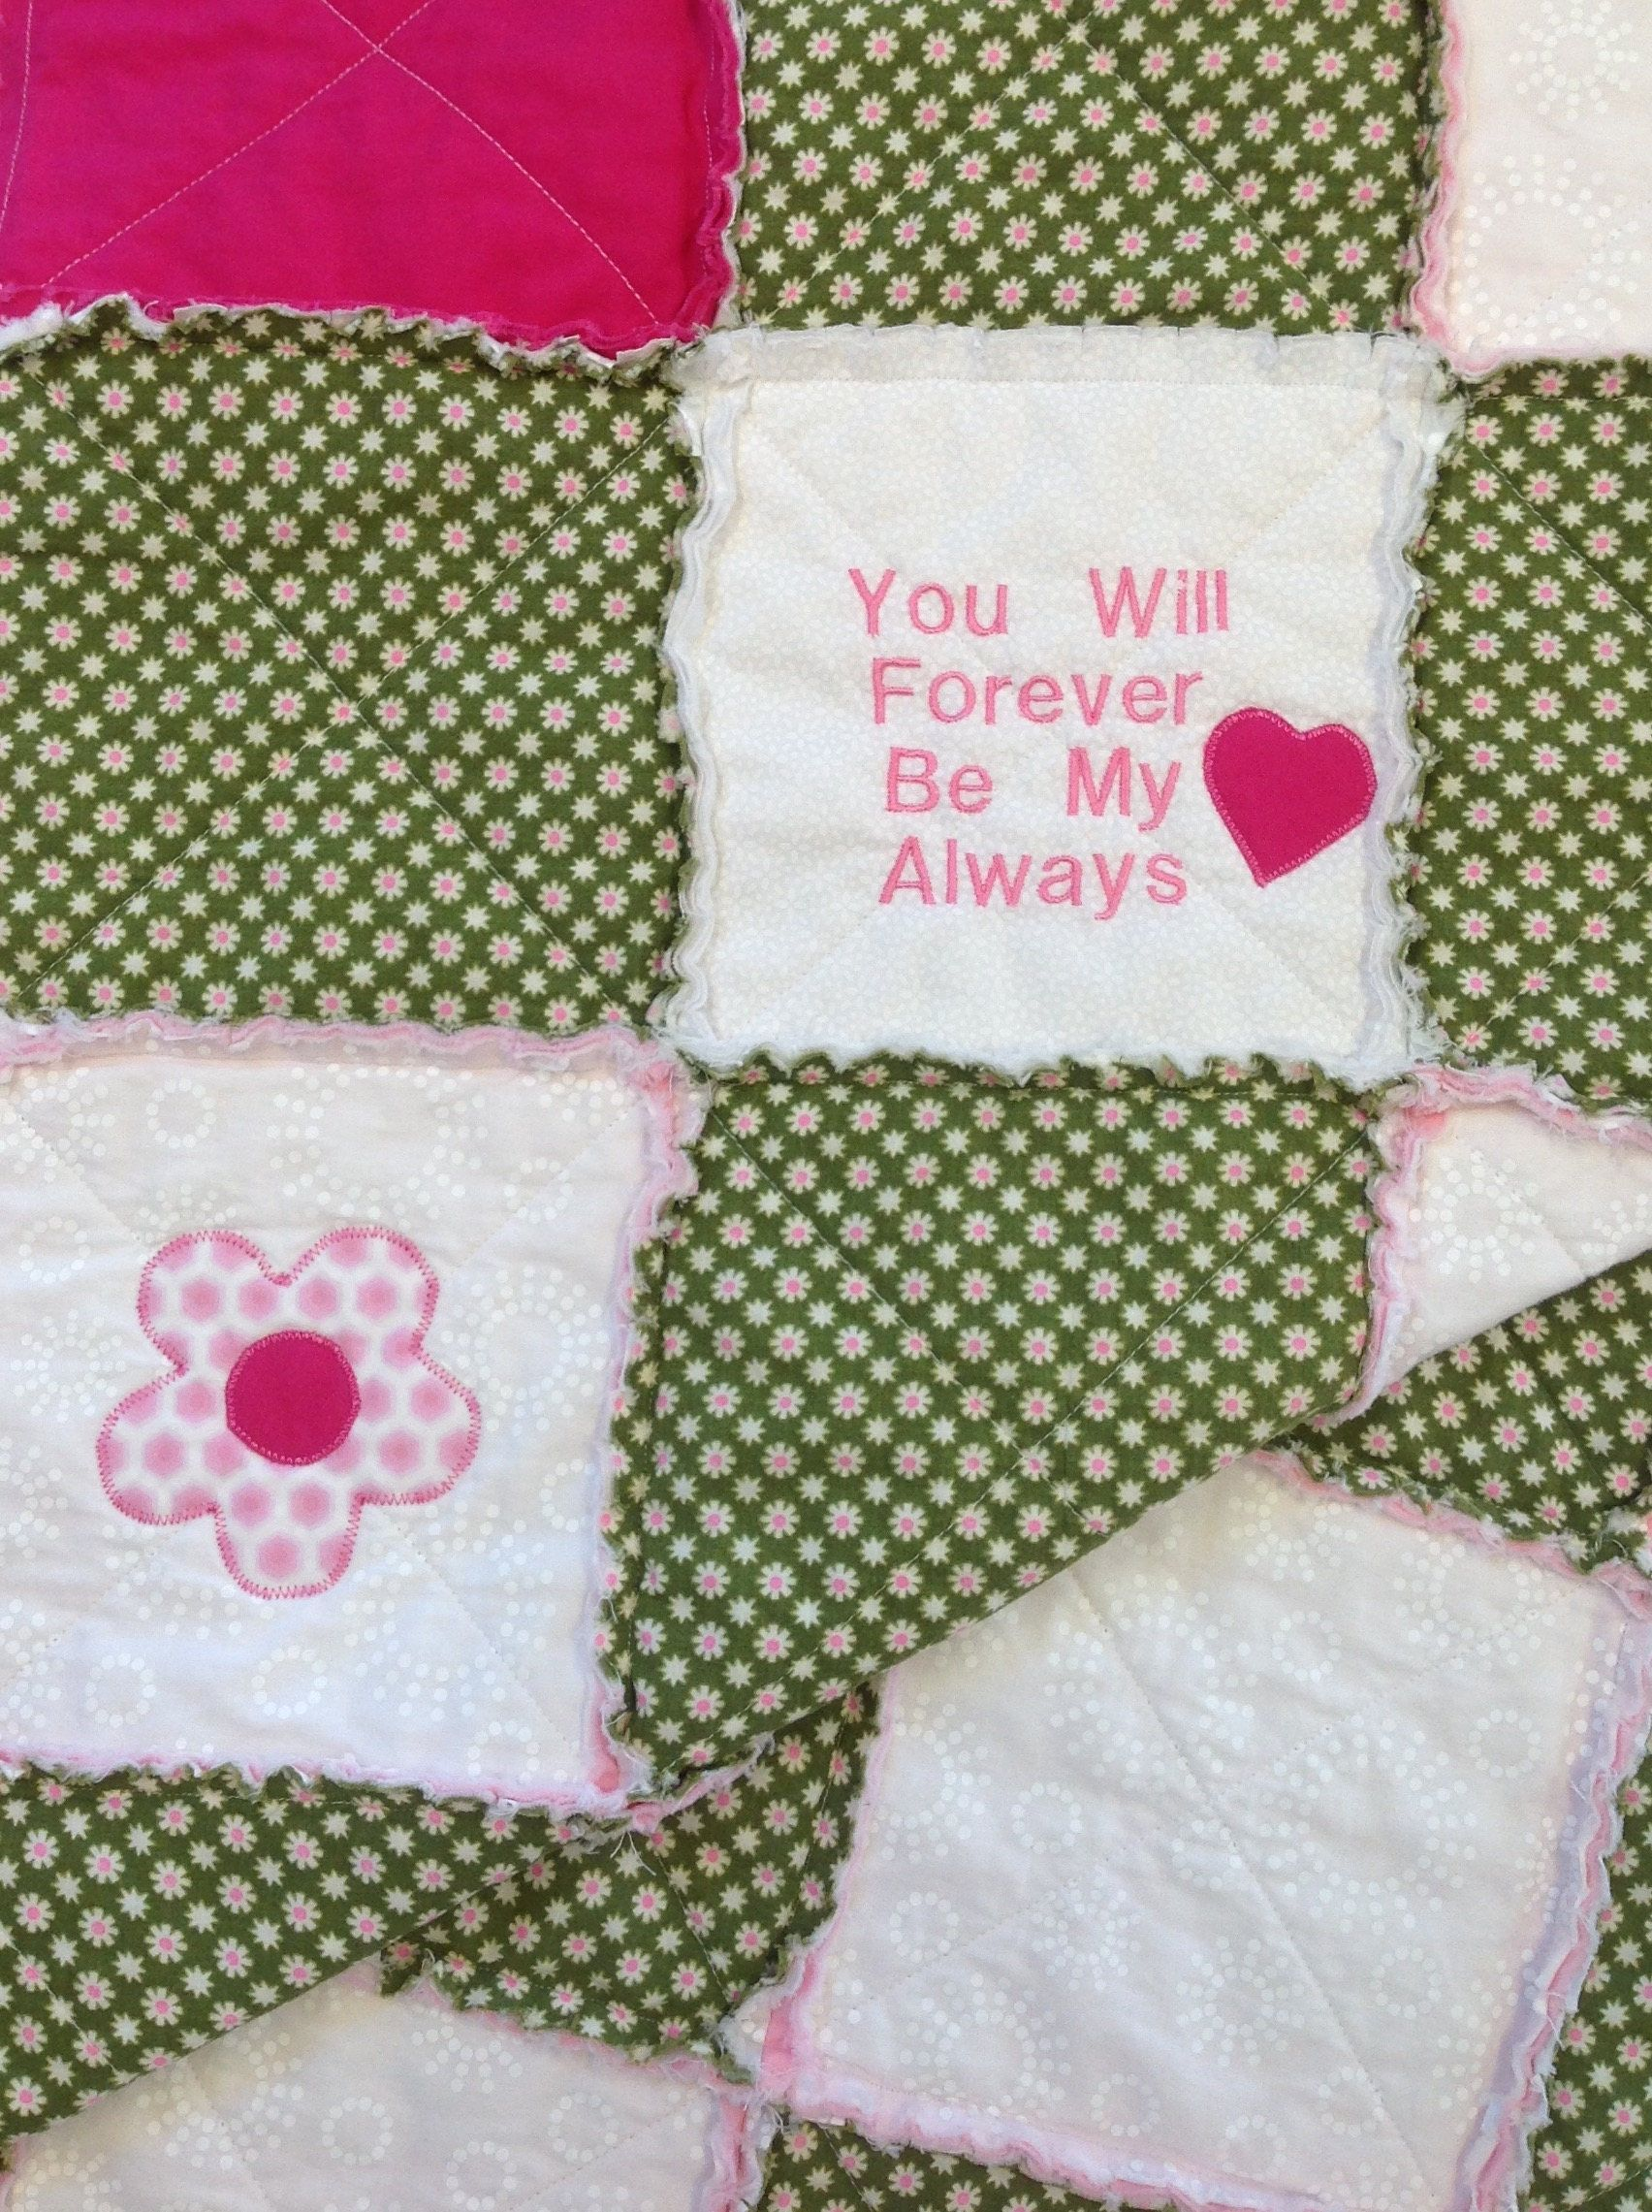 Embroidered Quilt, Appliqué Quilt, Floral Quilt, Girls Quilt, Rag ... : floral quilts for sale - Adamdwight.com